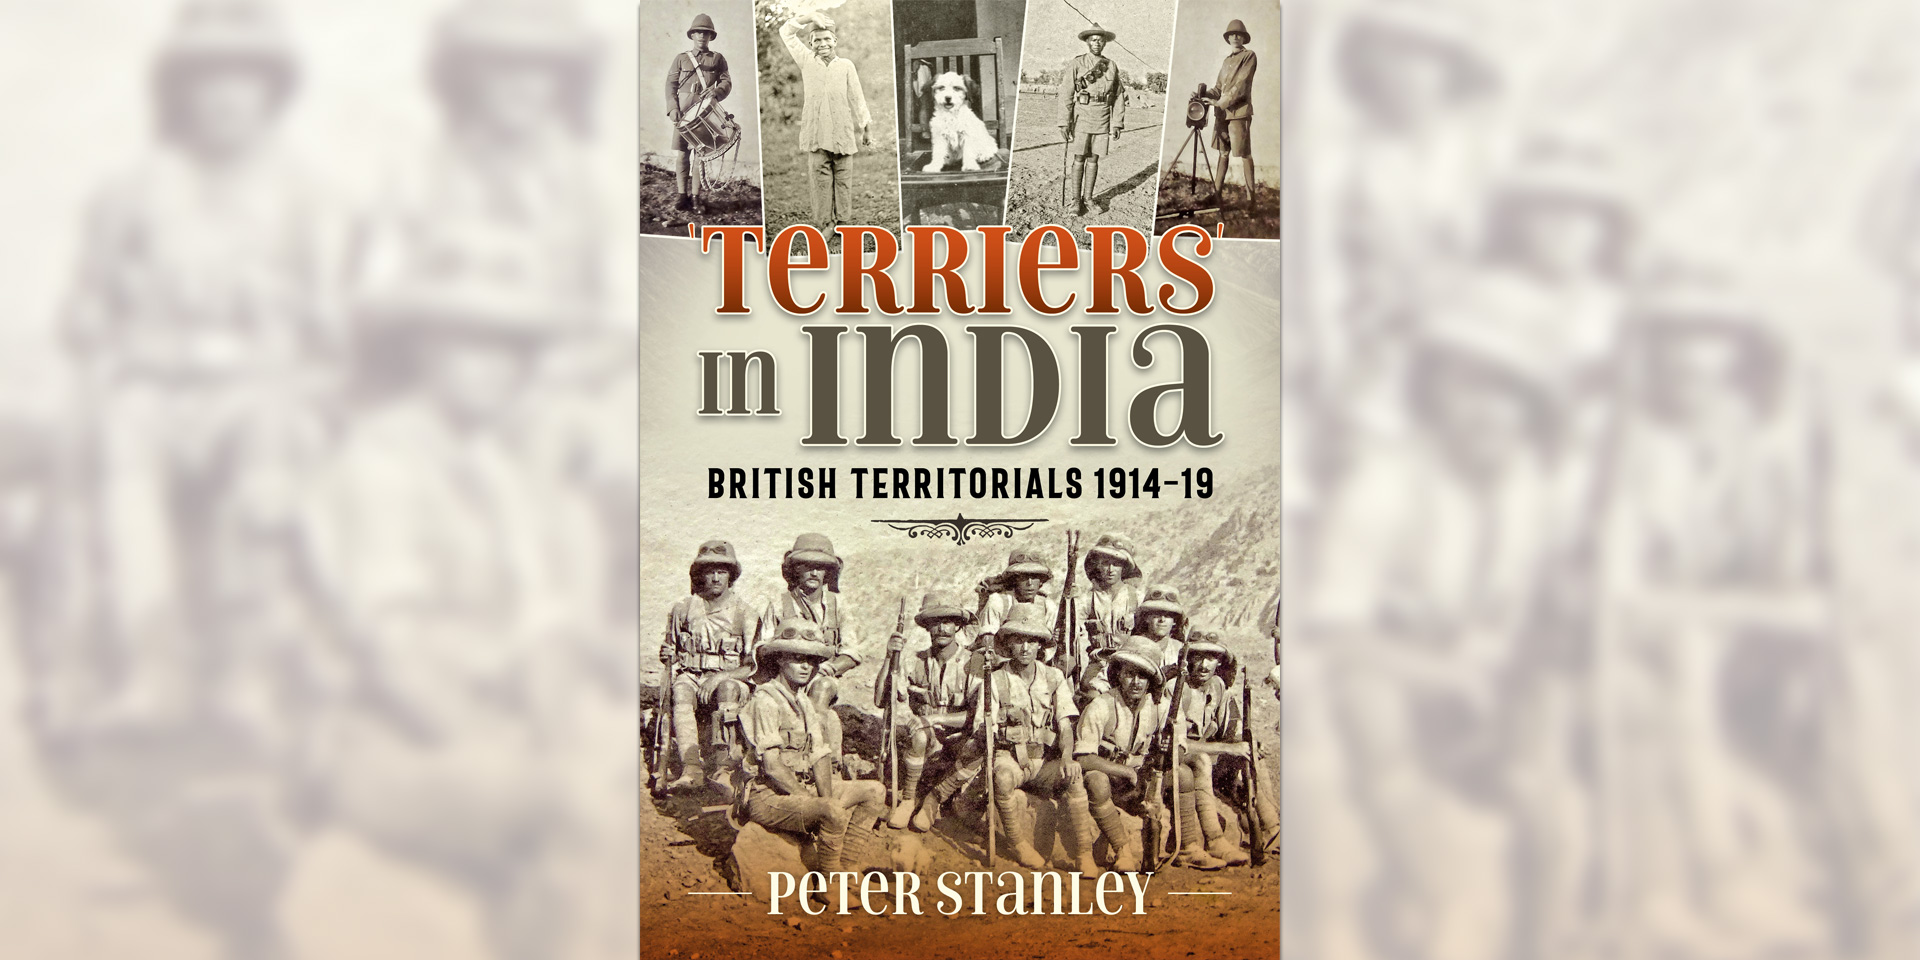 "'""Terriers"" in India: British Territorials, 1914-19' book cover"